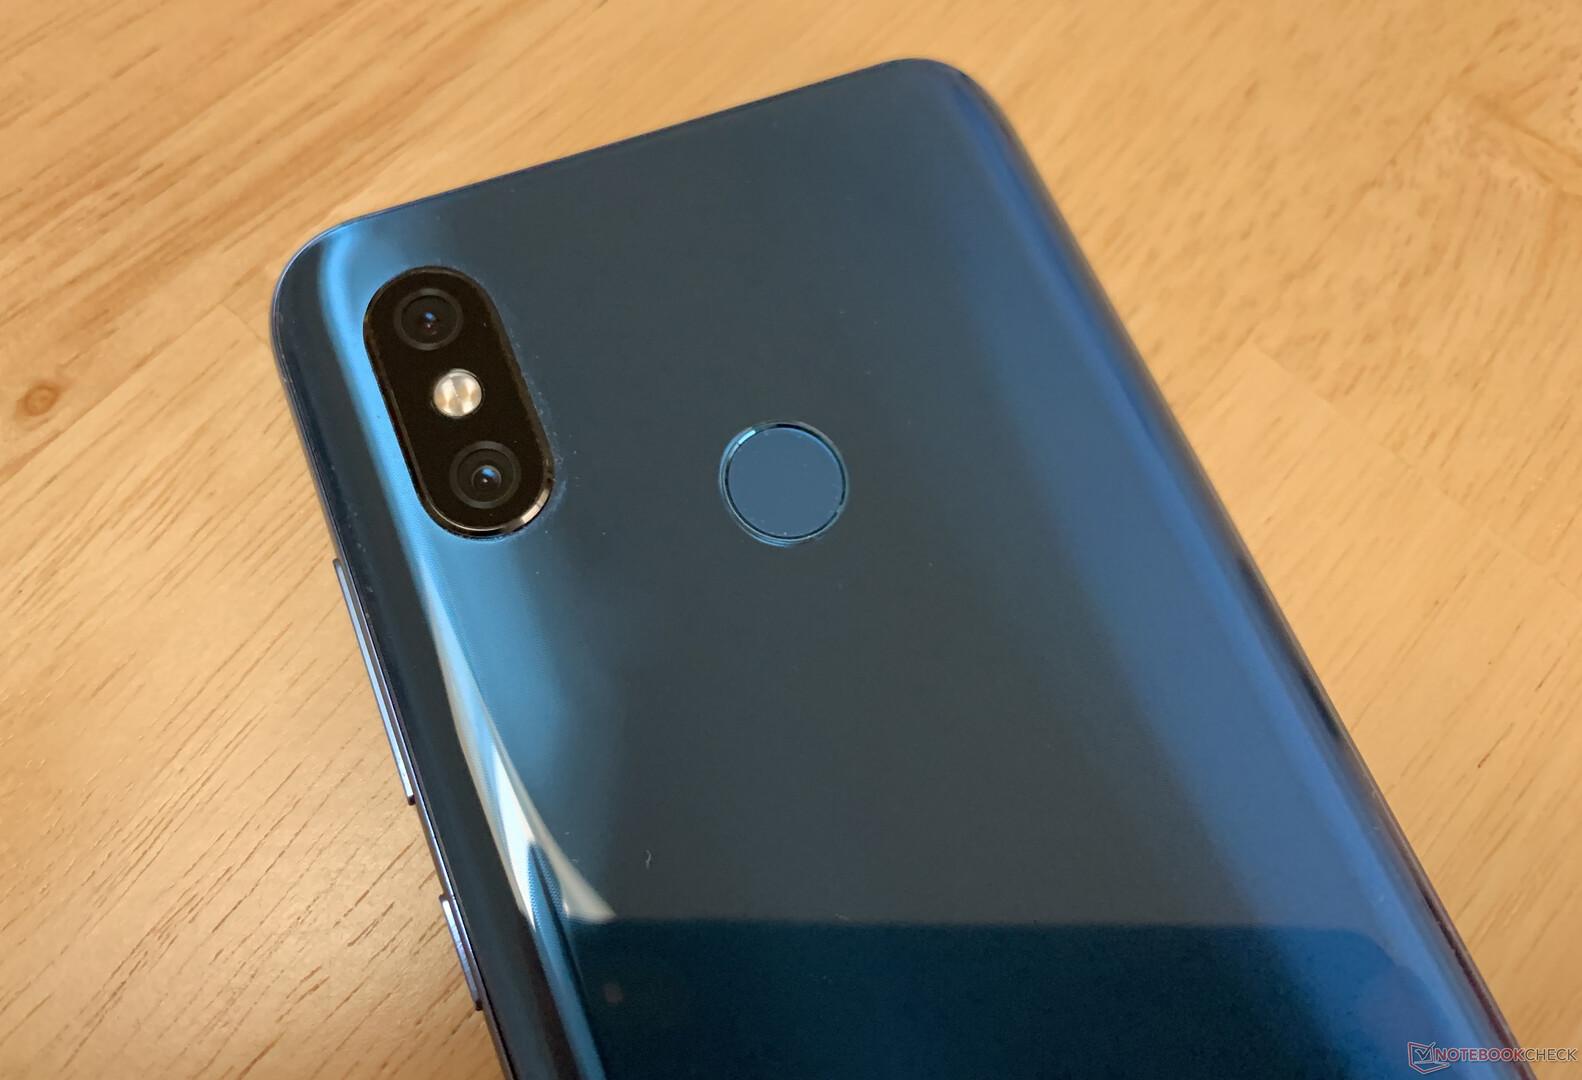 Xiaomi Mi 8 Smartphone Review - NotebookCheck net Reviews